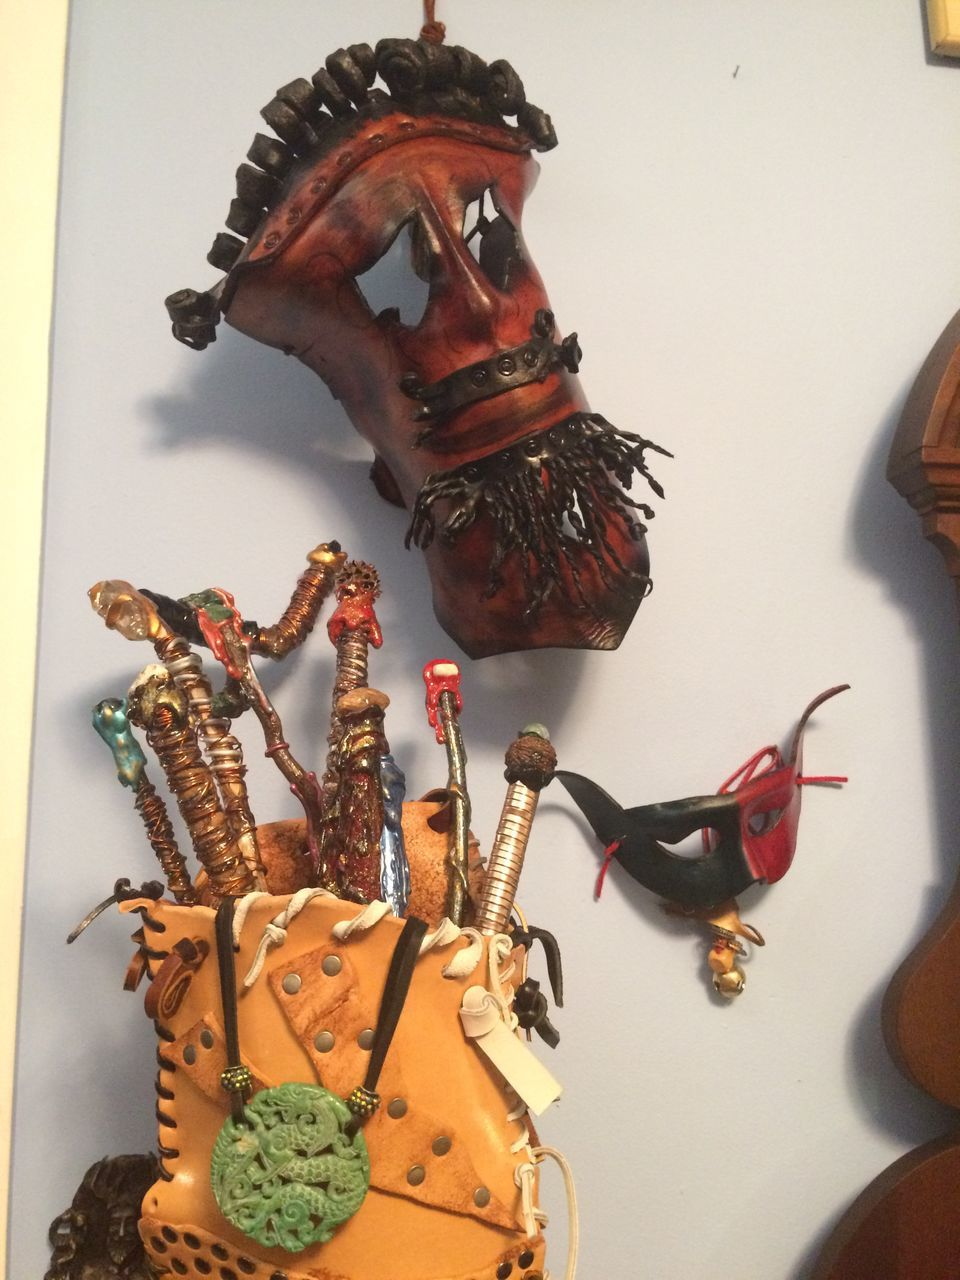 representation, art and craft, indoors, no people, still life, creativity, decoration, close-up, craft, human representation, sculpture, food, hanging, wall - building feature, mammal, choice, livestock